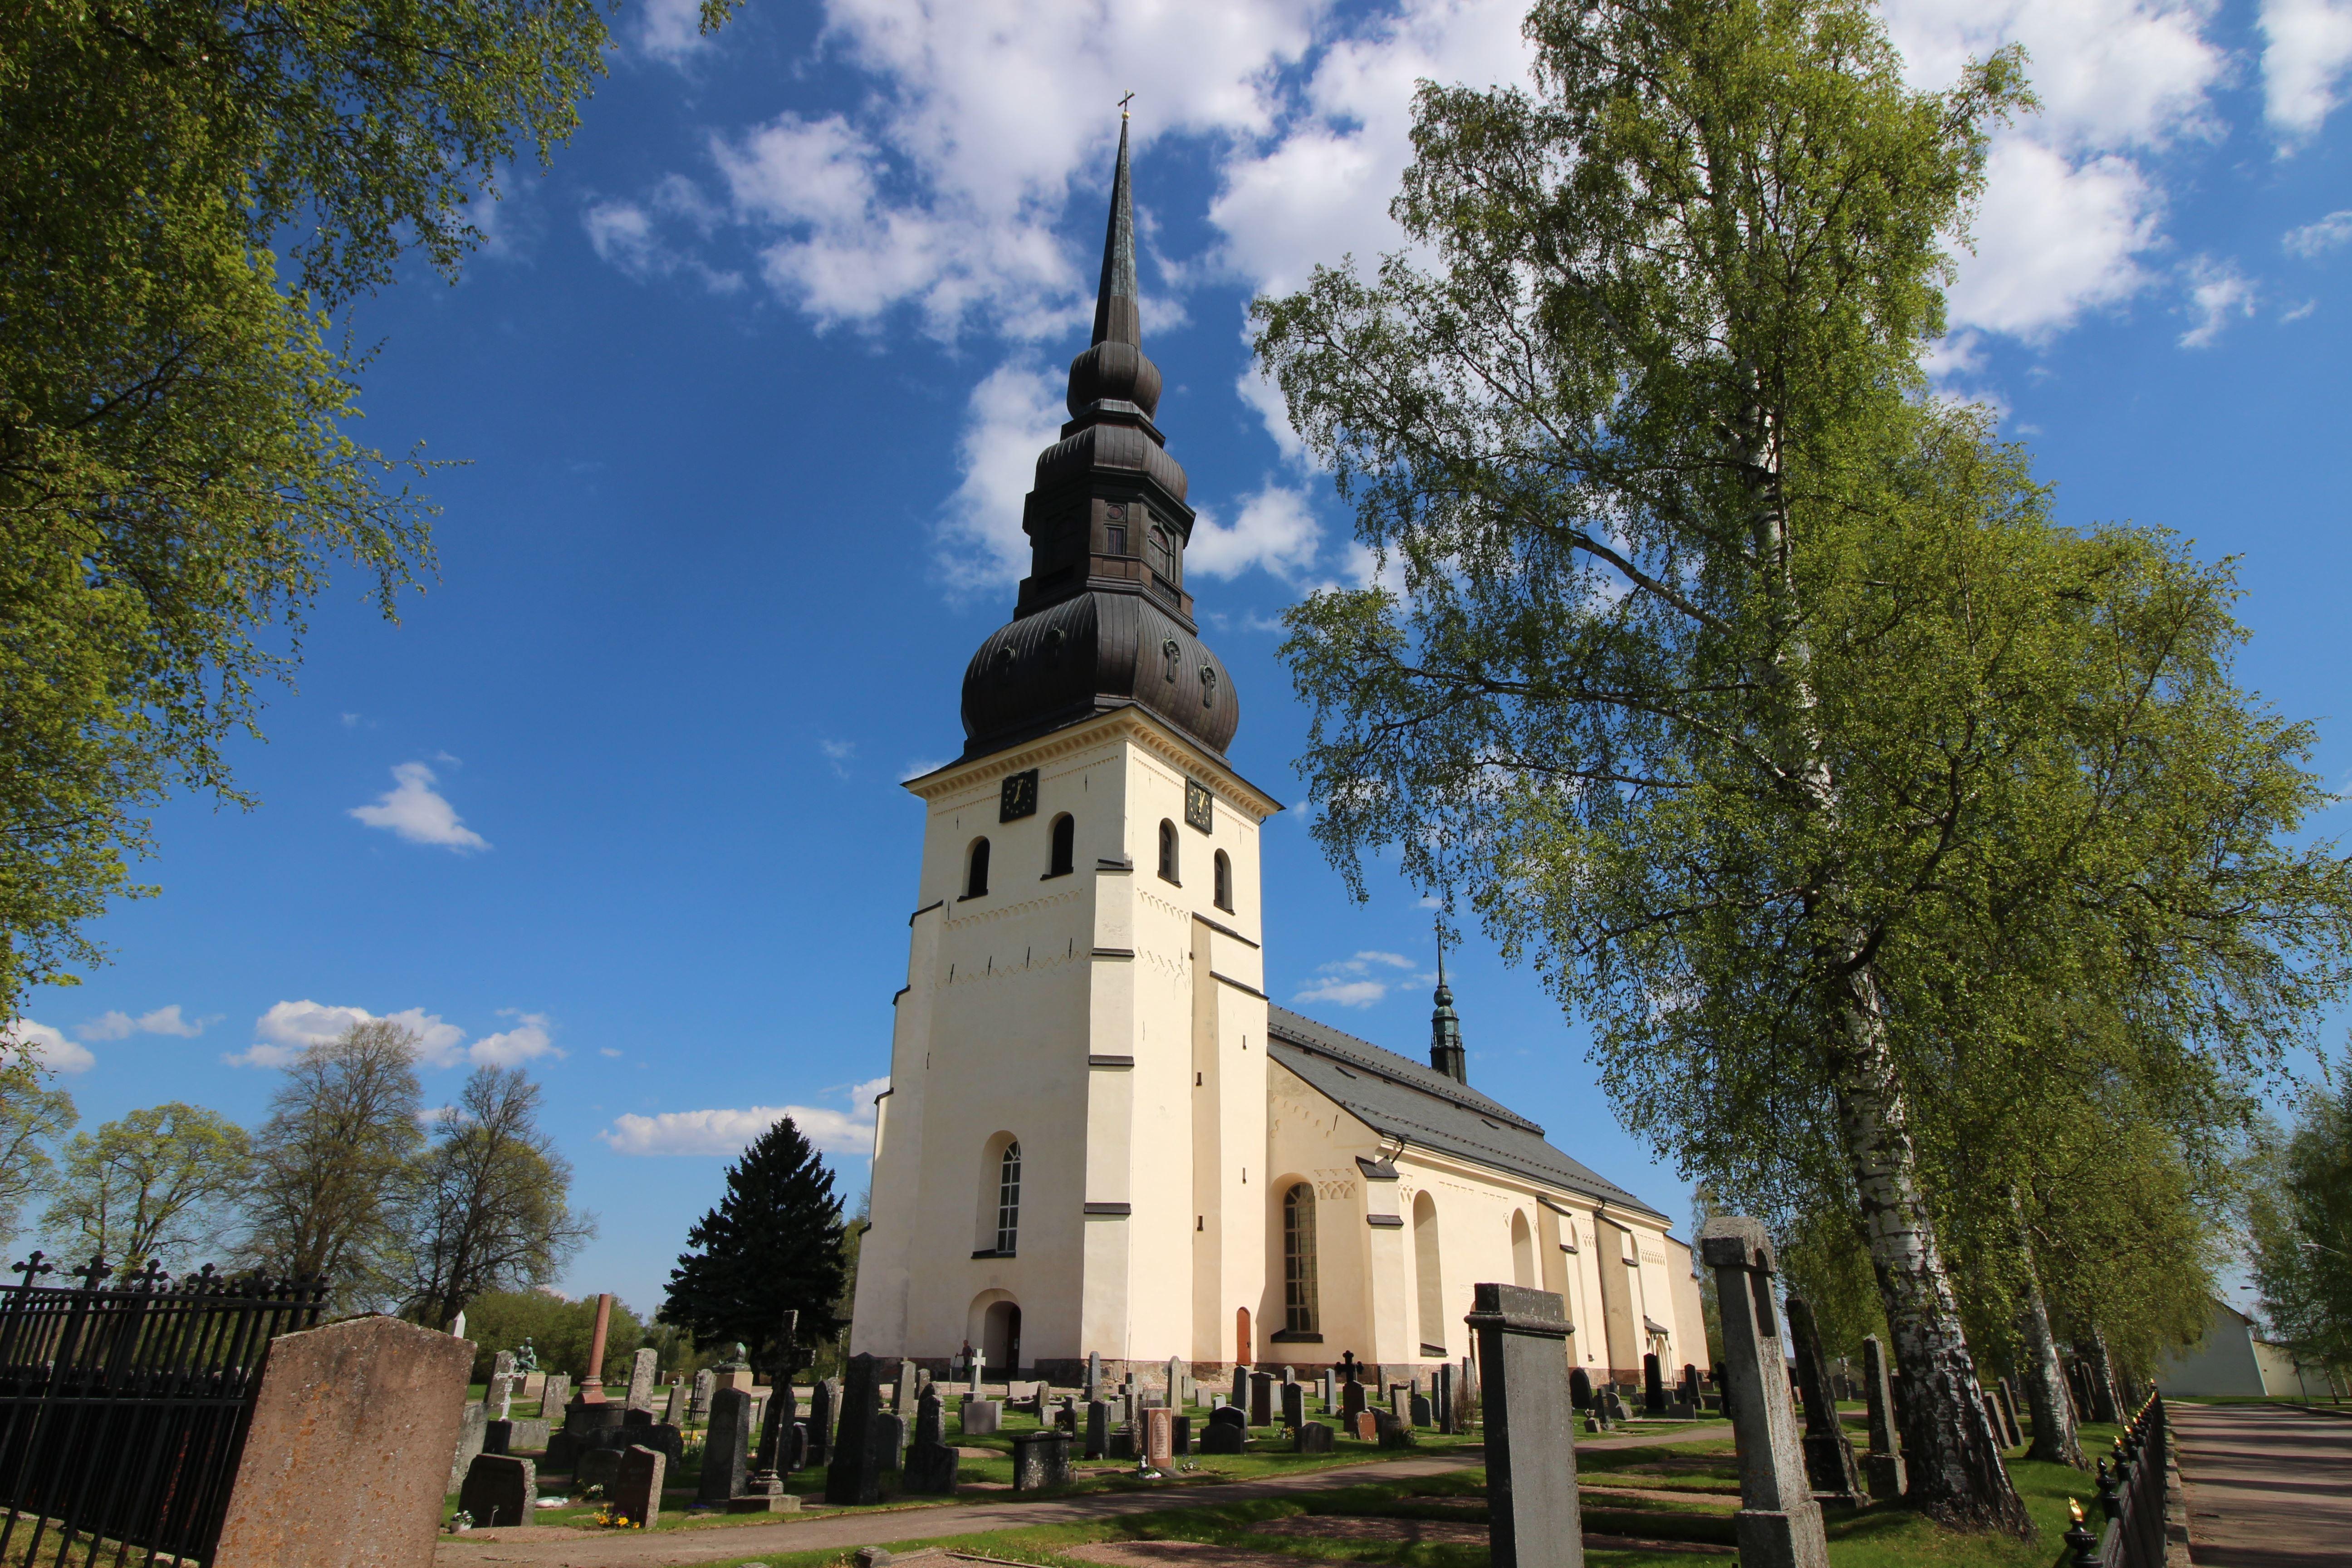 Tour of Stora Tuna kyrka (copy)